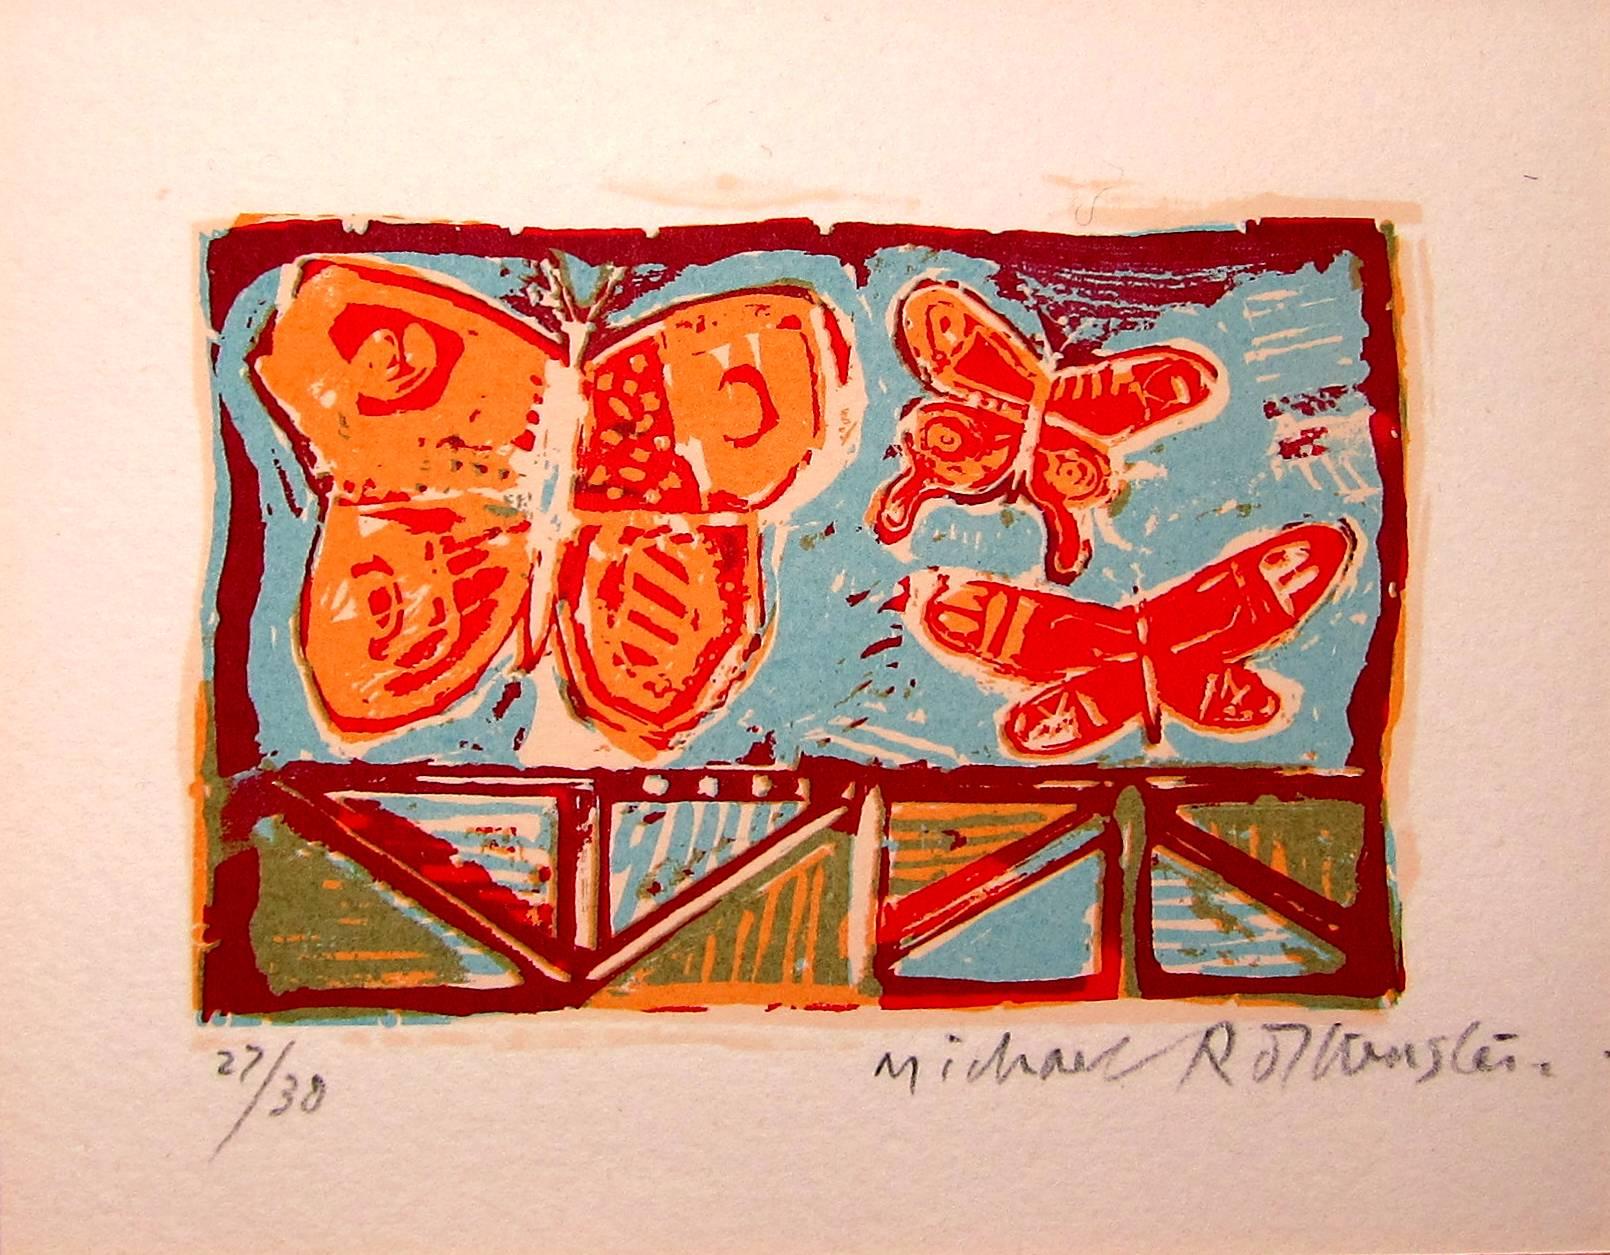 Lot 40 - MICHAEL ROTHENSTEIN R.A. [1908-93]. 3 Butterflies, 1981. screenprint, edition of 30 [27/30],